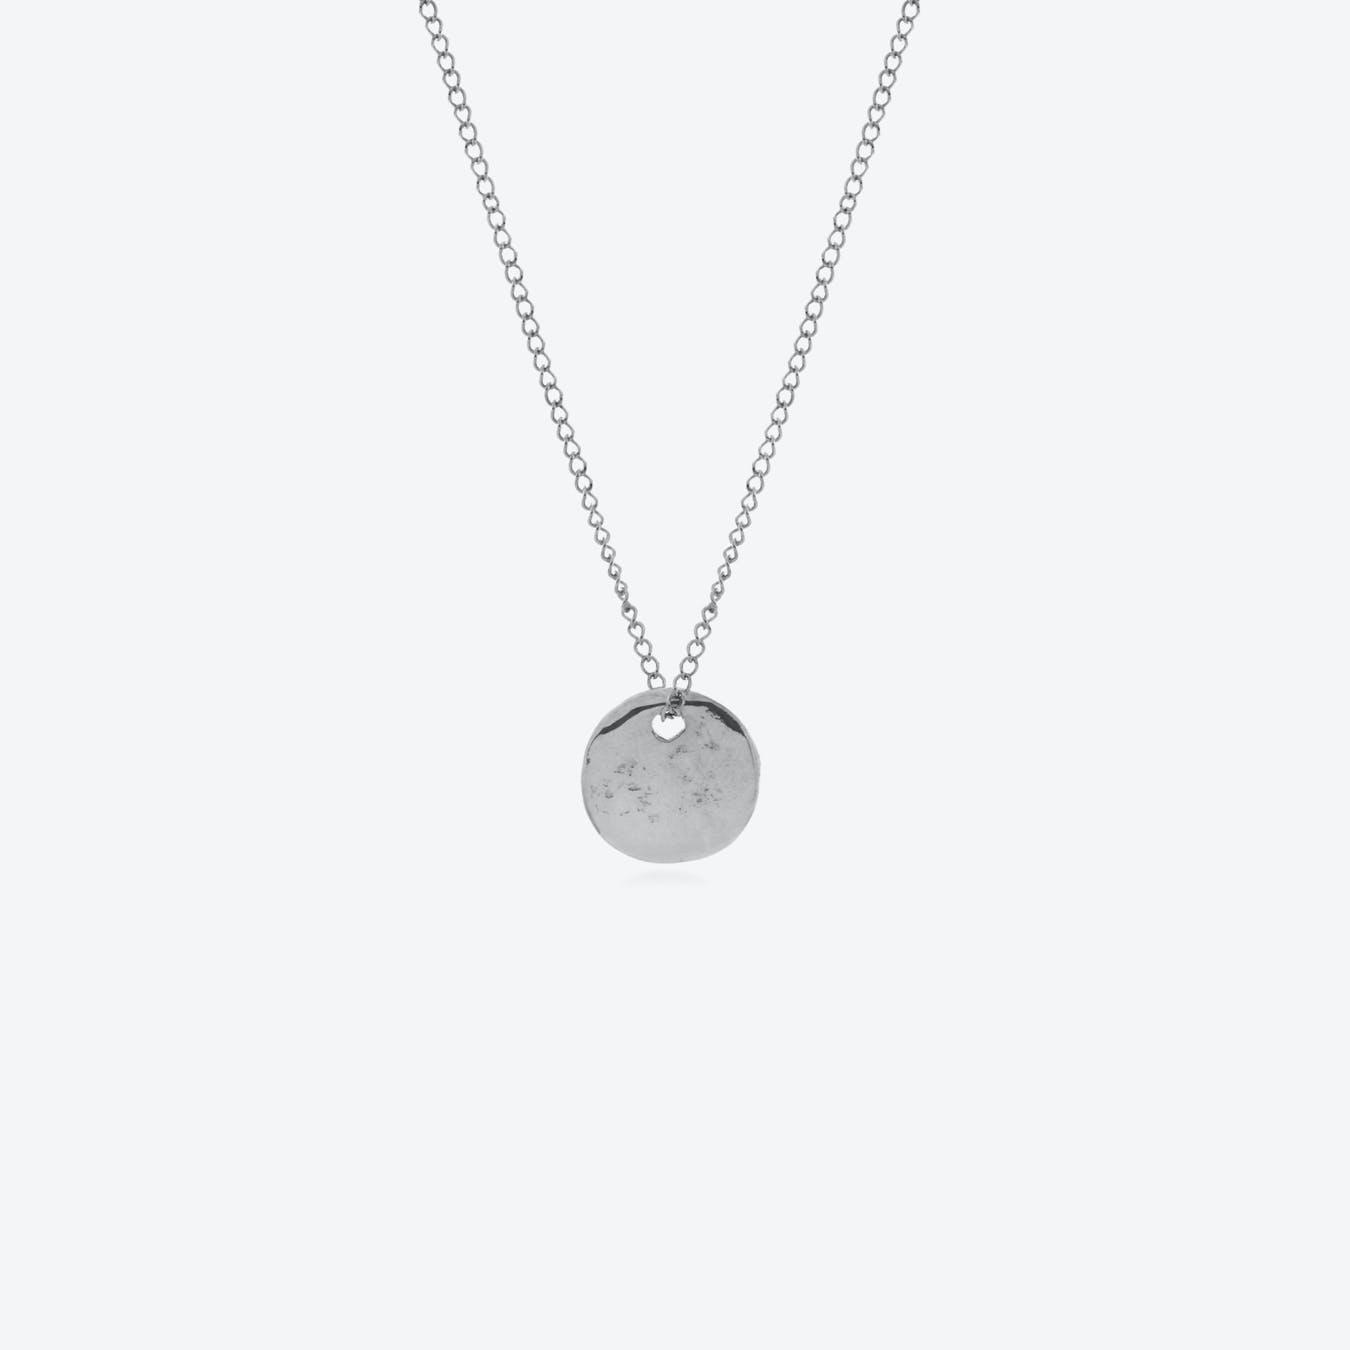 Disco Inferno Necklace - Silver